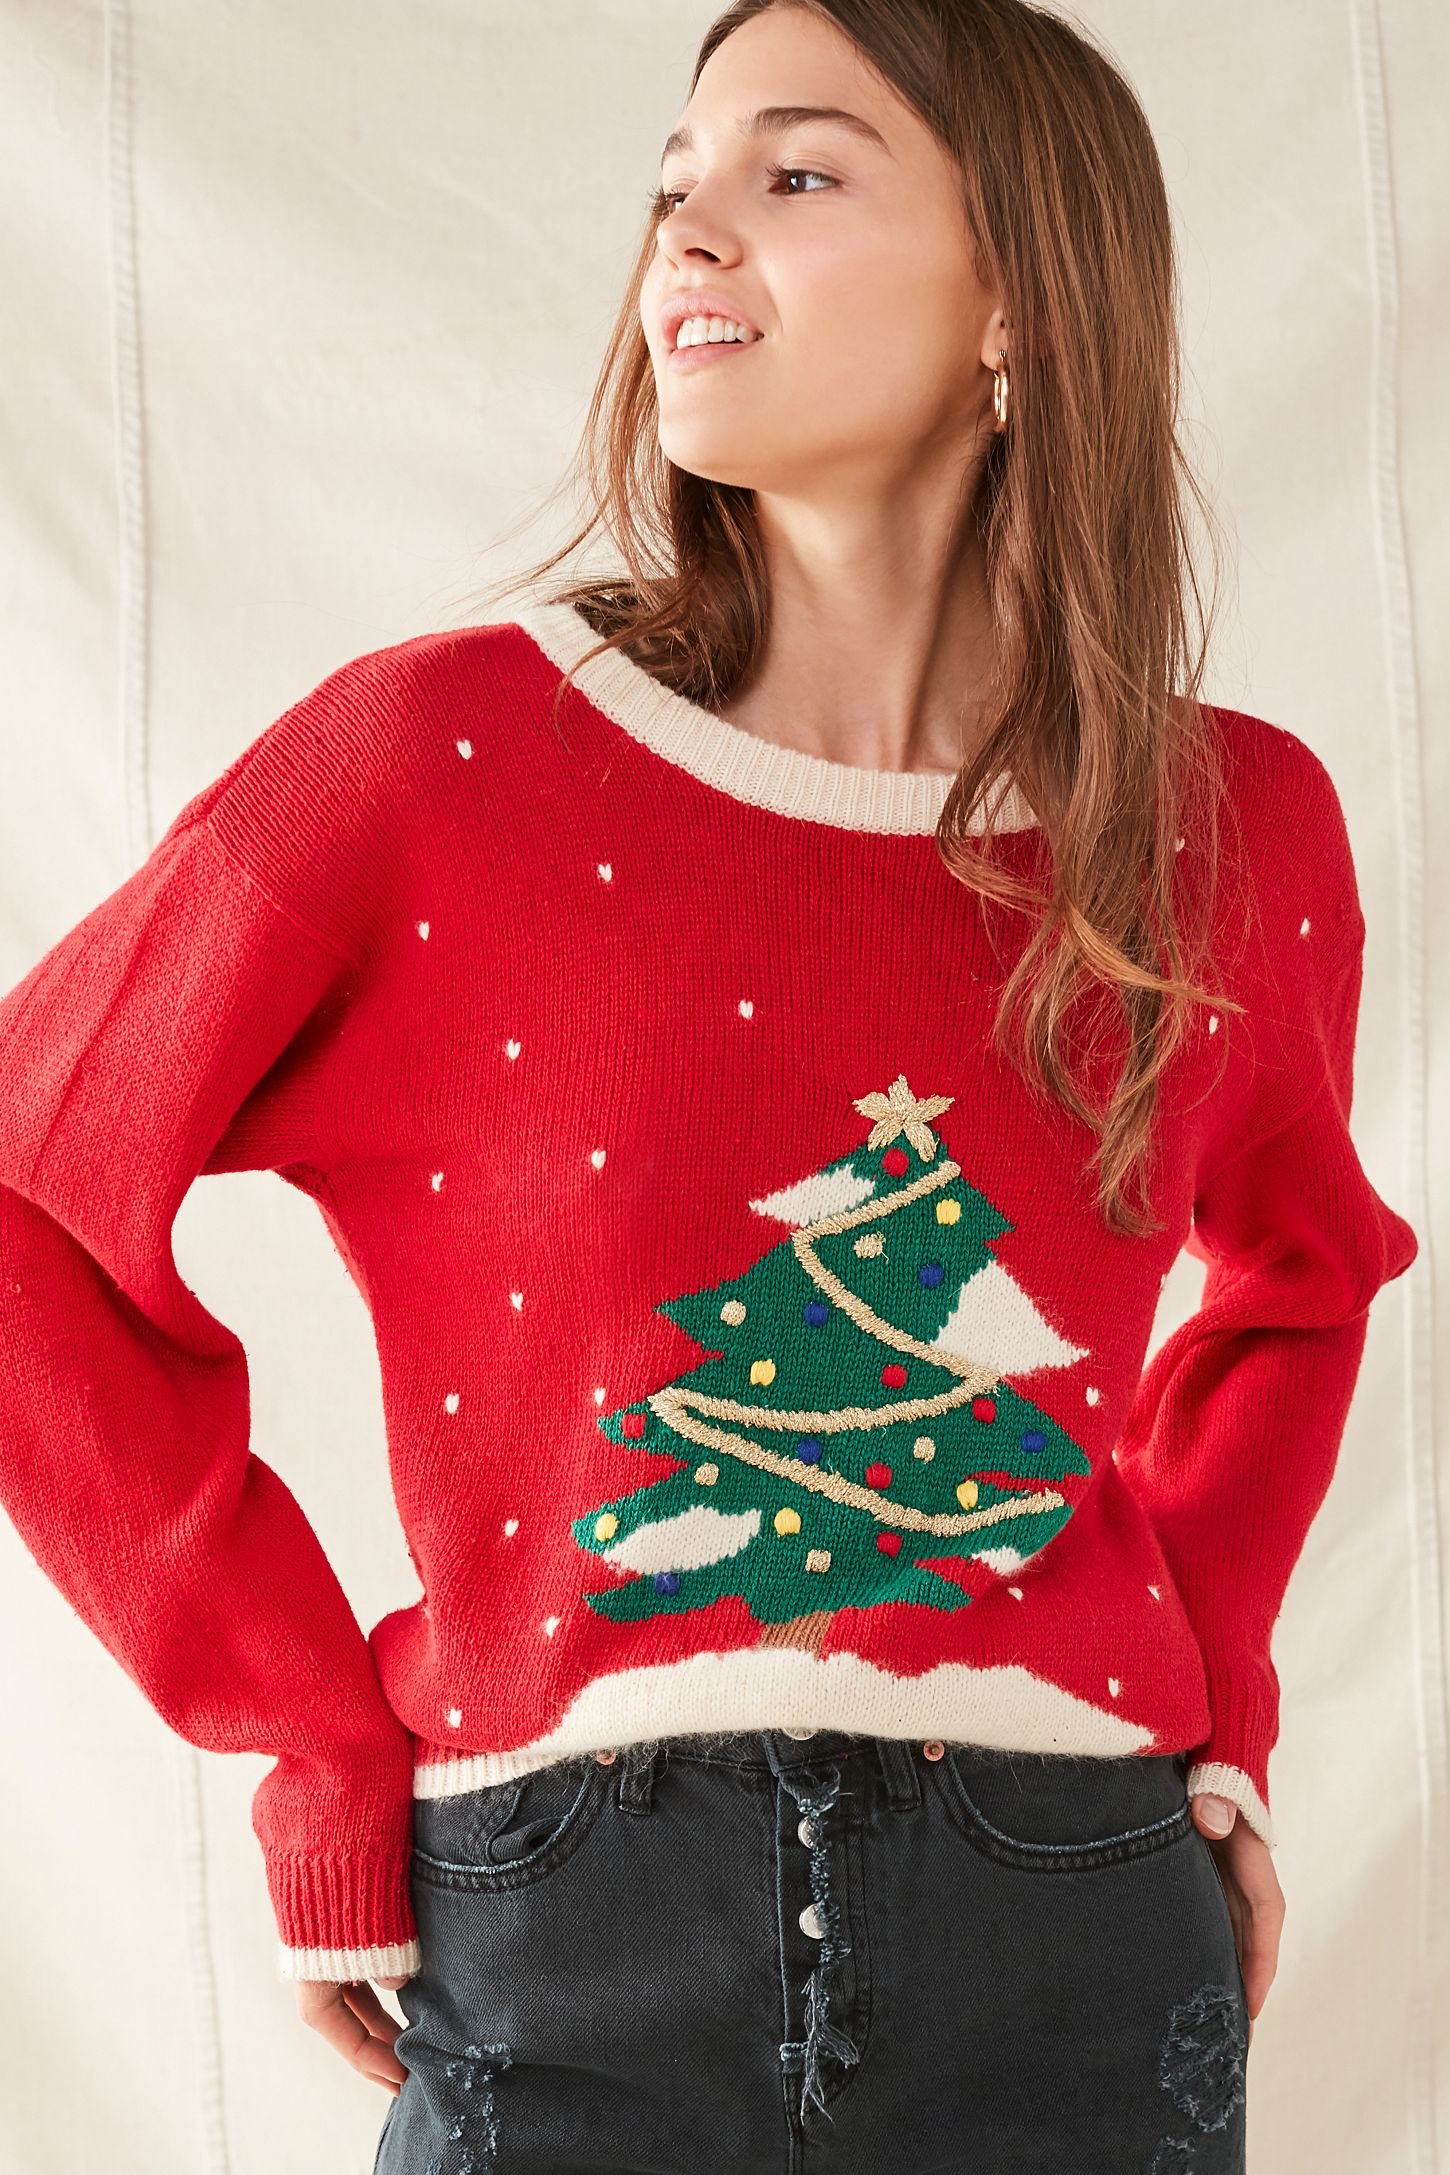 7caa961ed97 Vintage Holiday Sweater